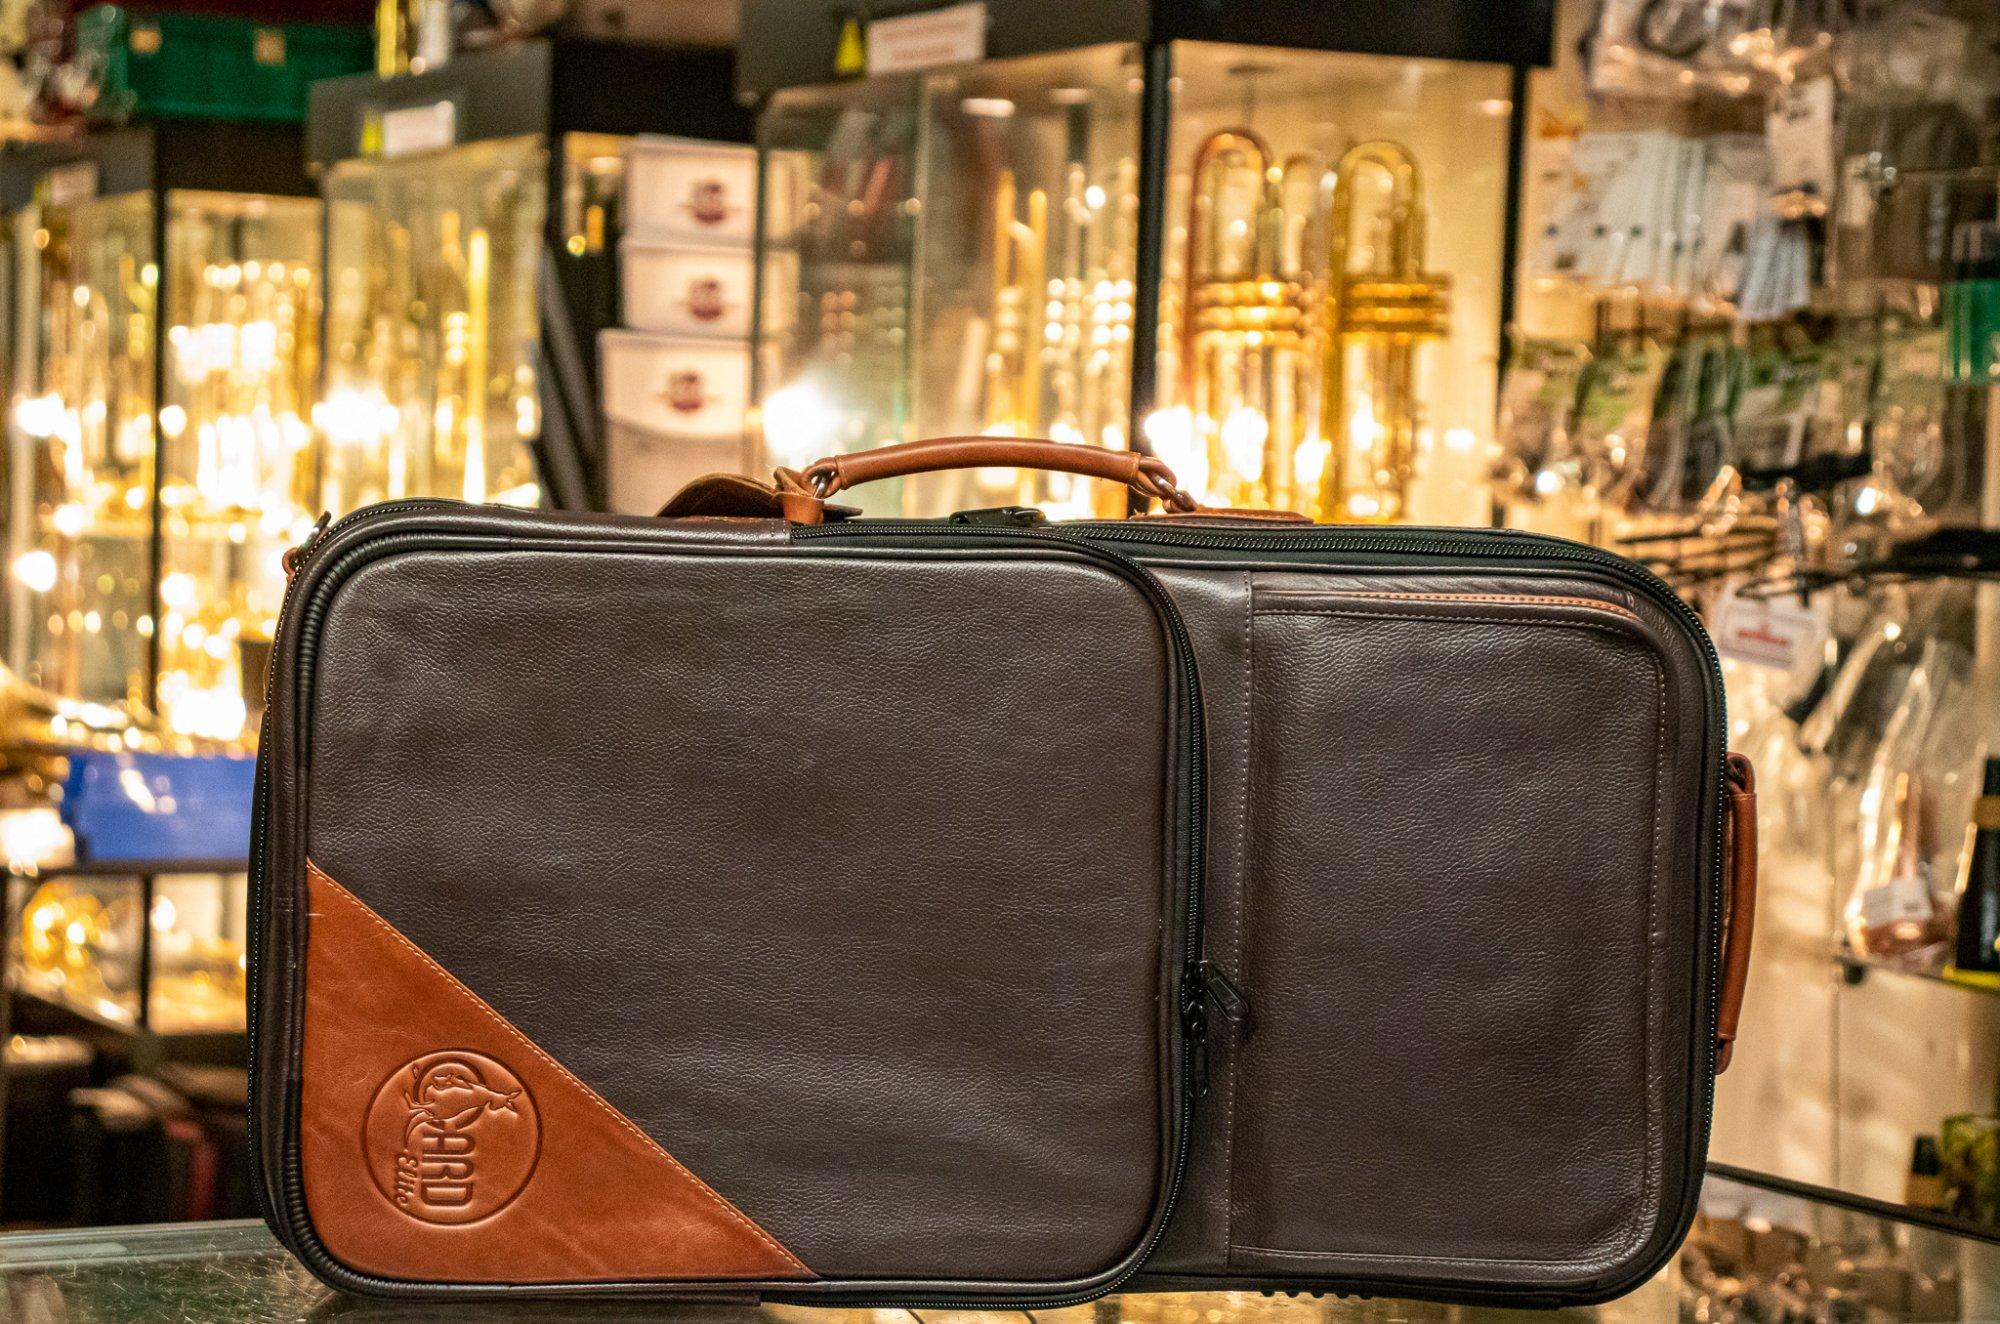 Gard Elite Compact Triple Leather Dark Chocolate